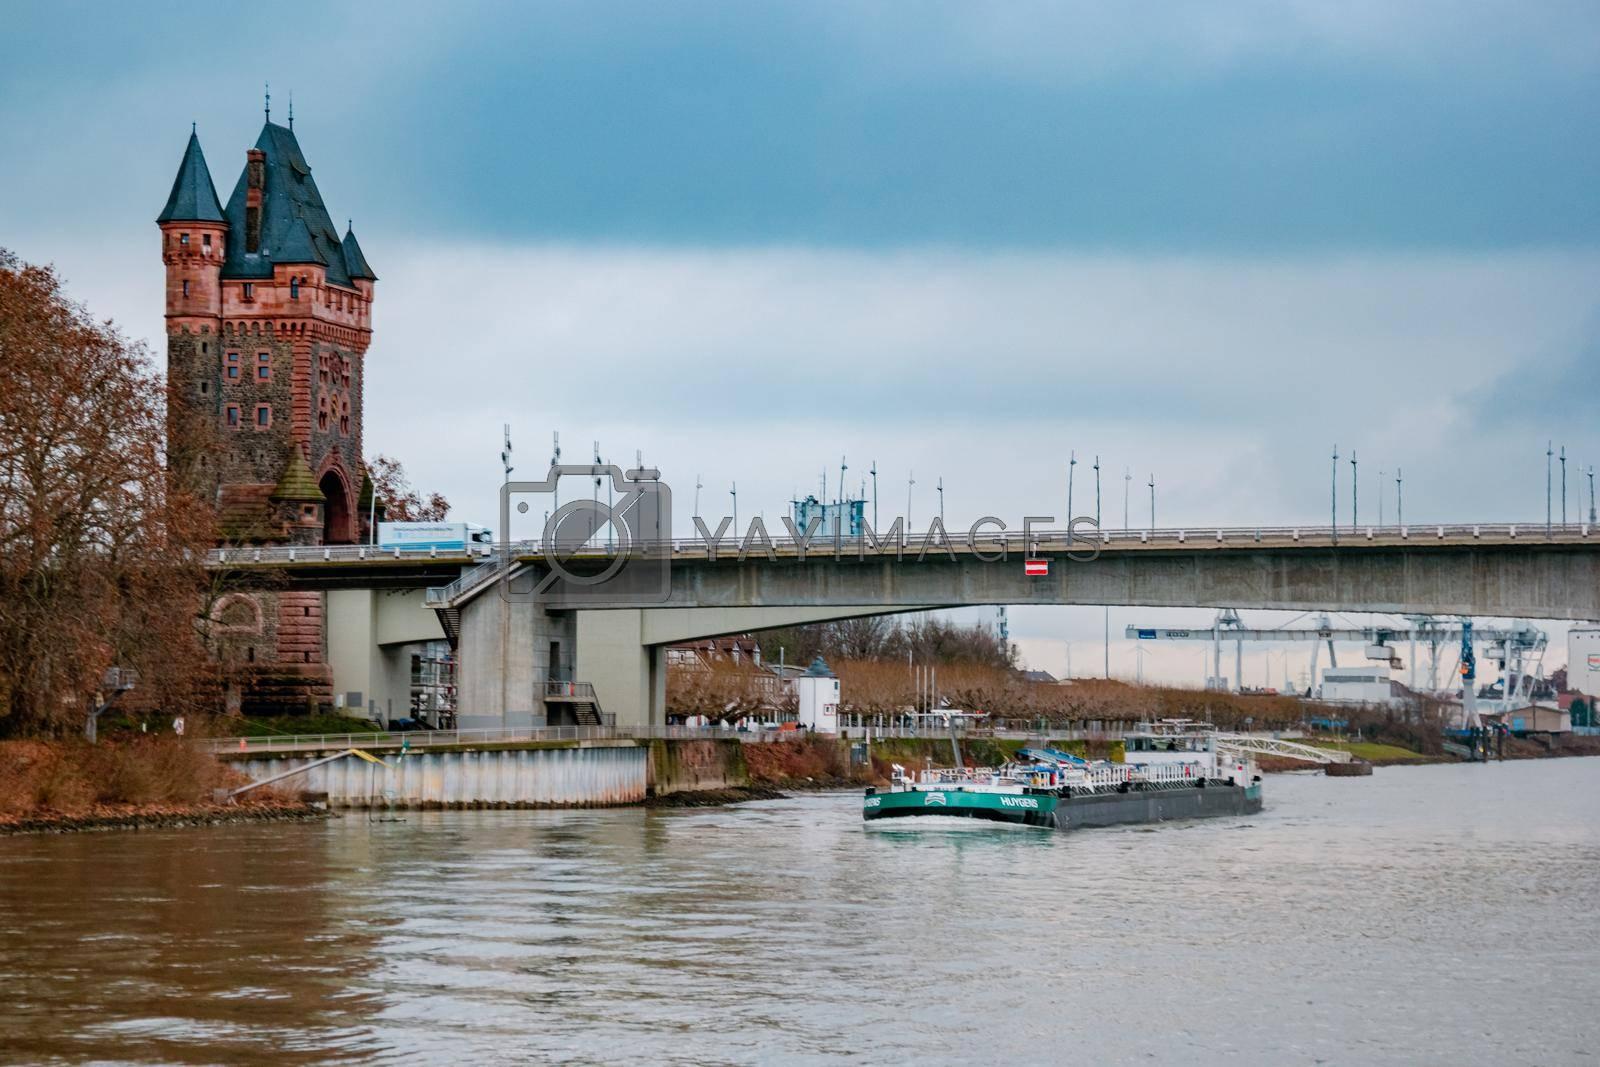 Worms Germany December 2020, Binnenvaart, Translation Inlandshipping on the river rhein Gas tanker vessel Rhine Germany oil and gas transport.